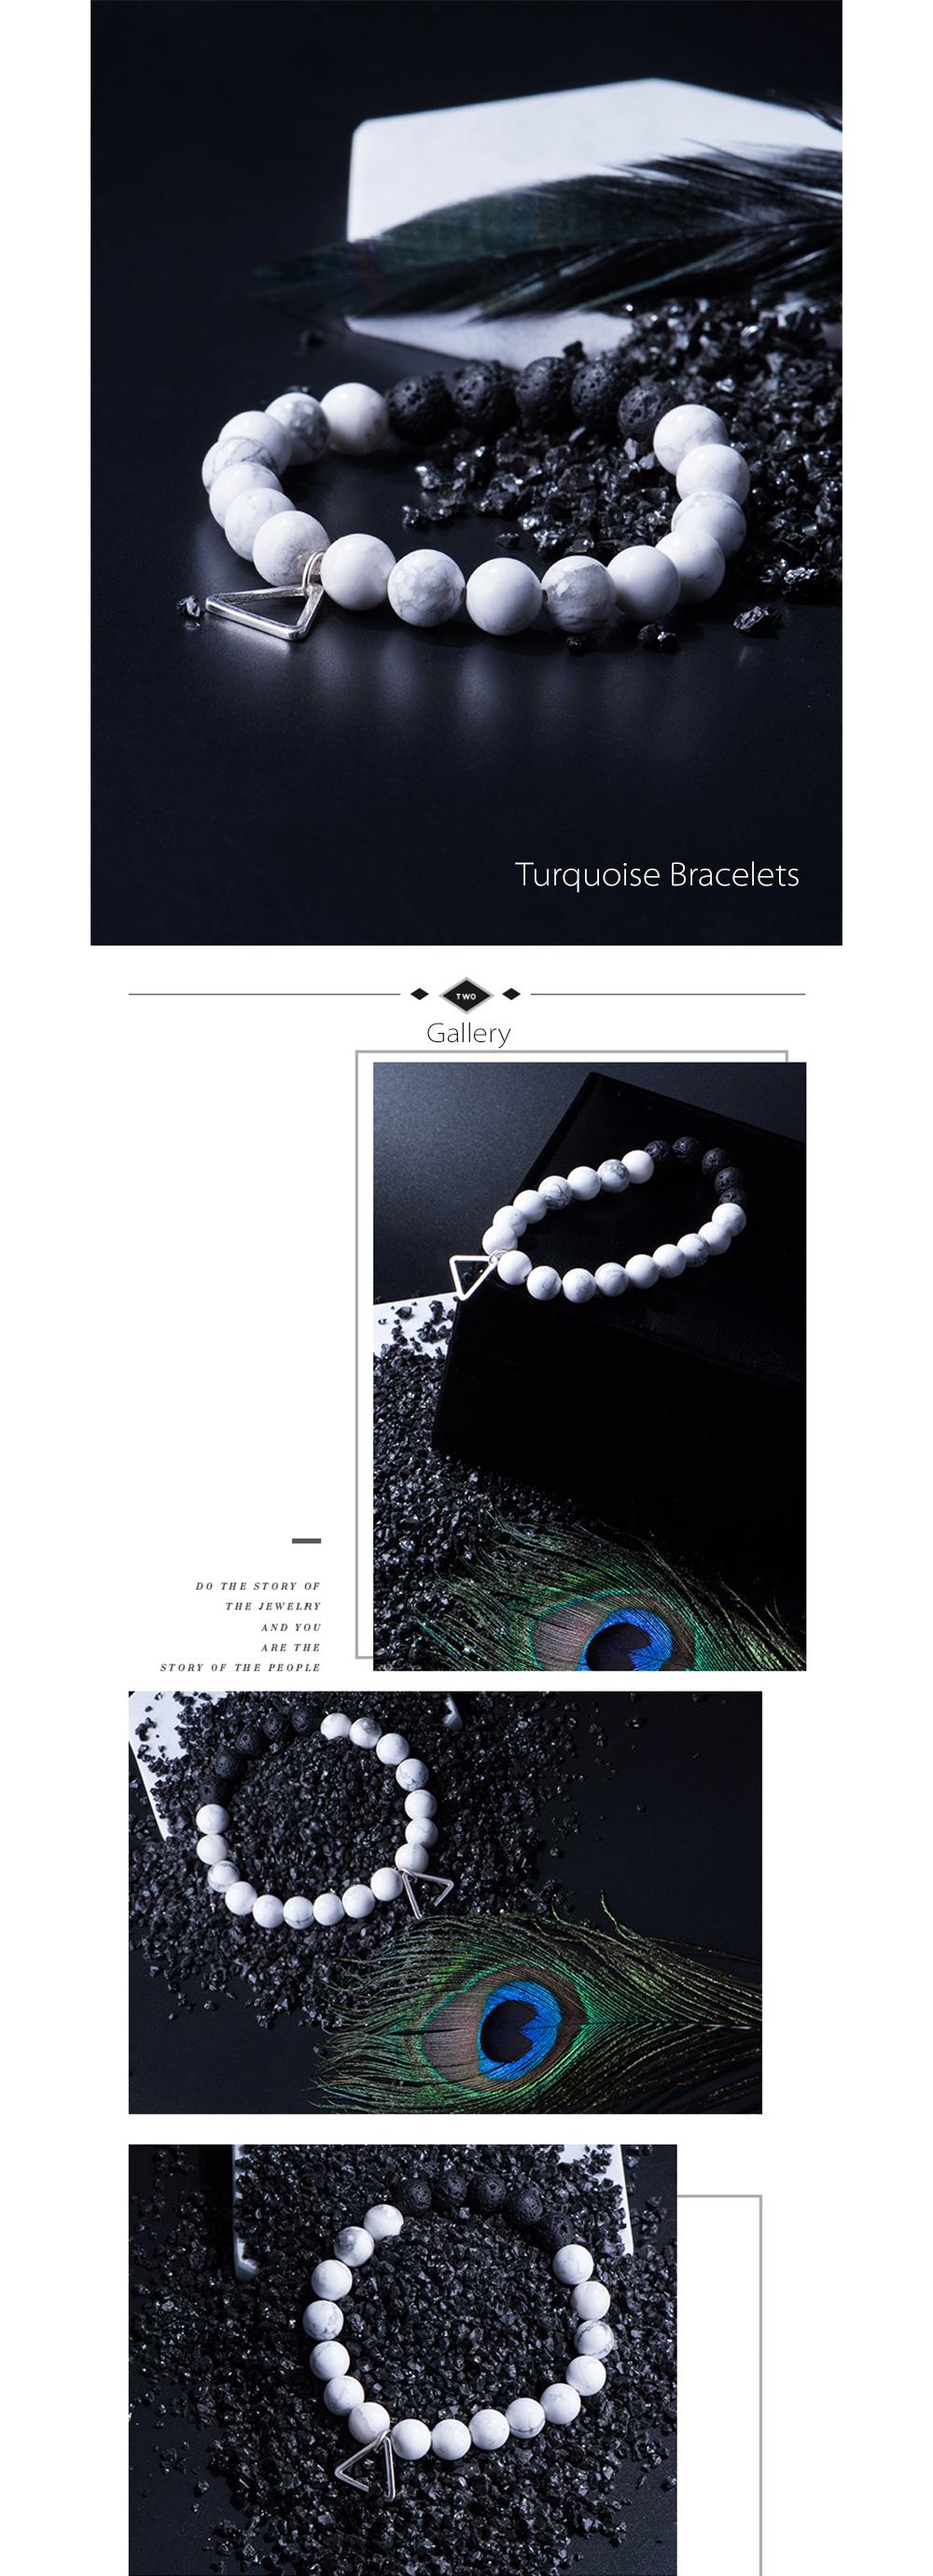 White Turquoise Bracelet With Lava Stones